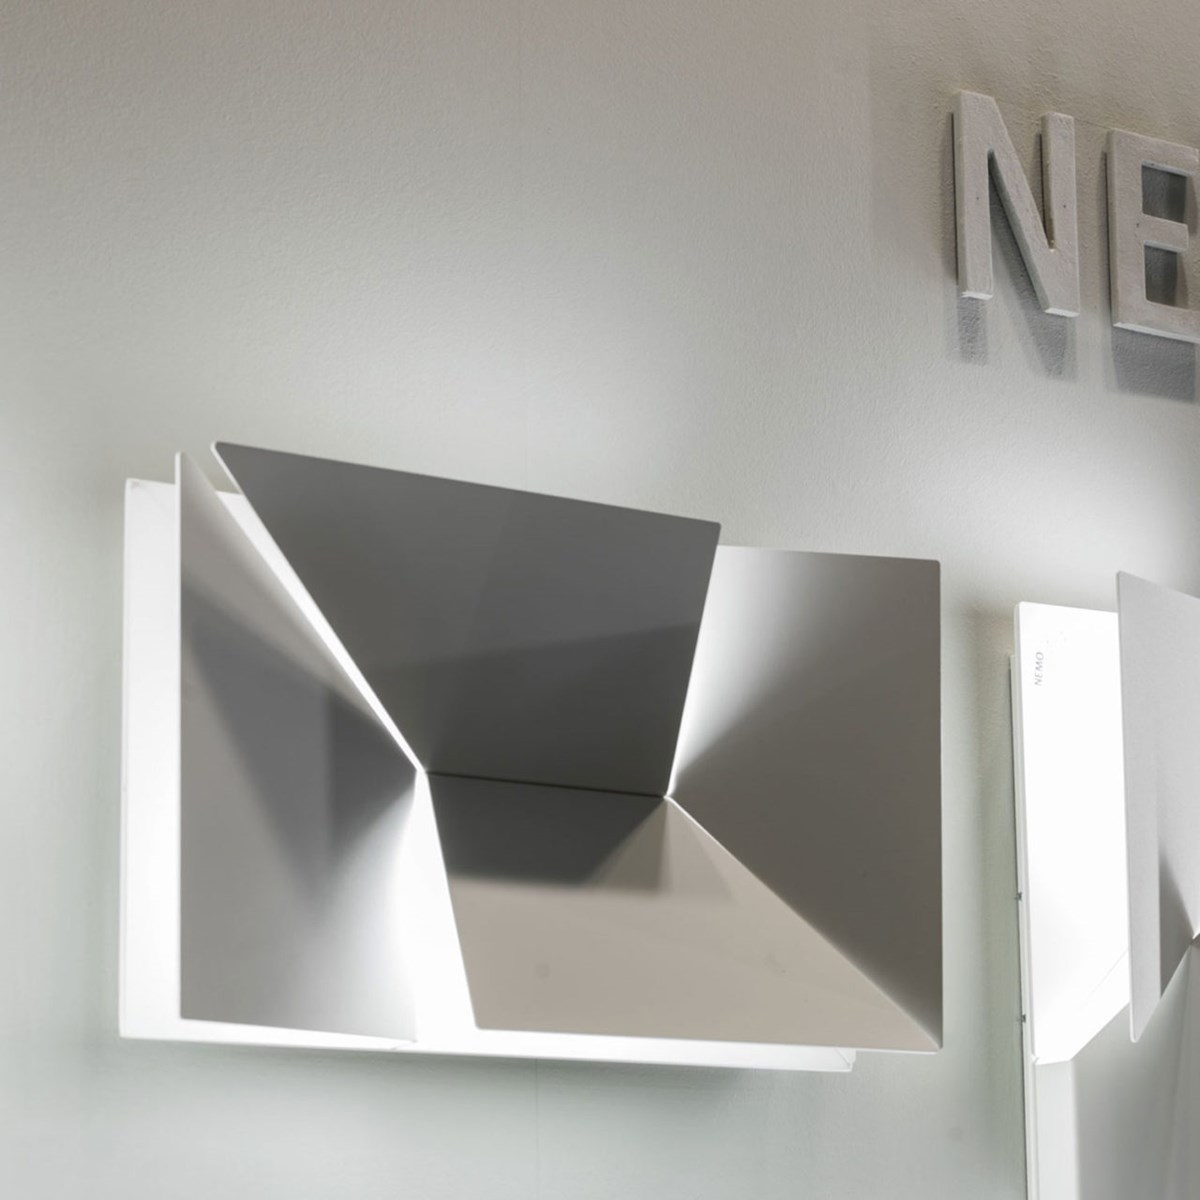 Nemo-Charles-Kalpakian-Wall-Shadows-Moyen-Light-Matisse-9